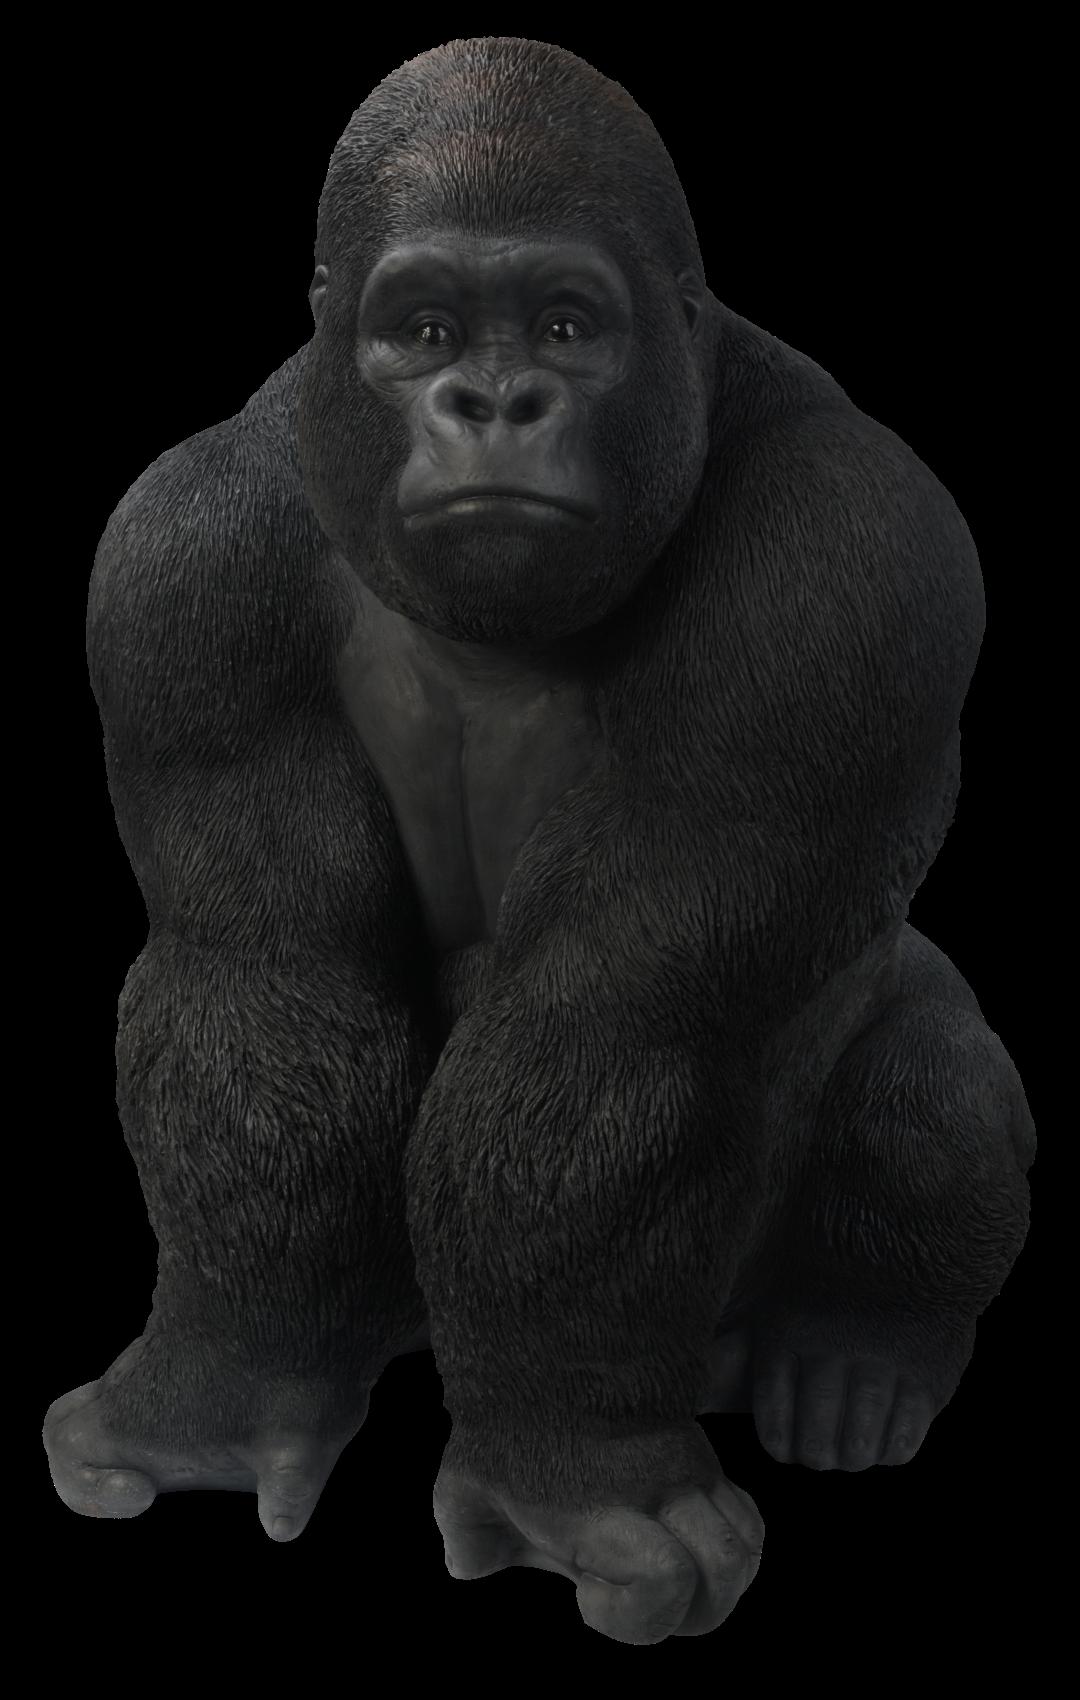 Gorilla PNG - 12147